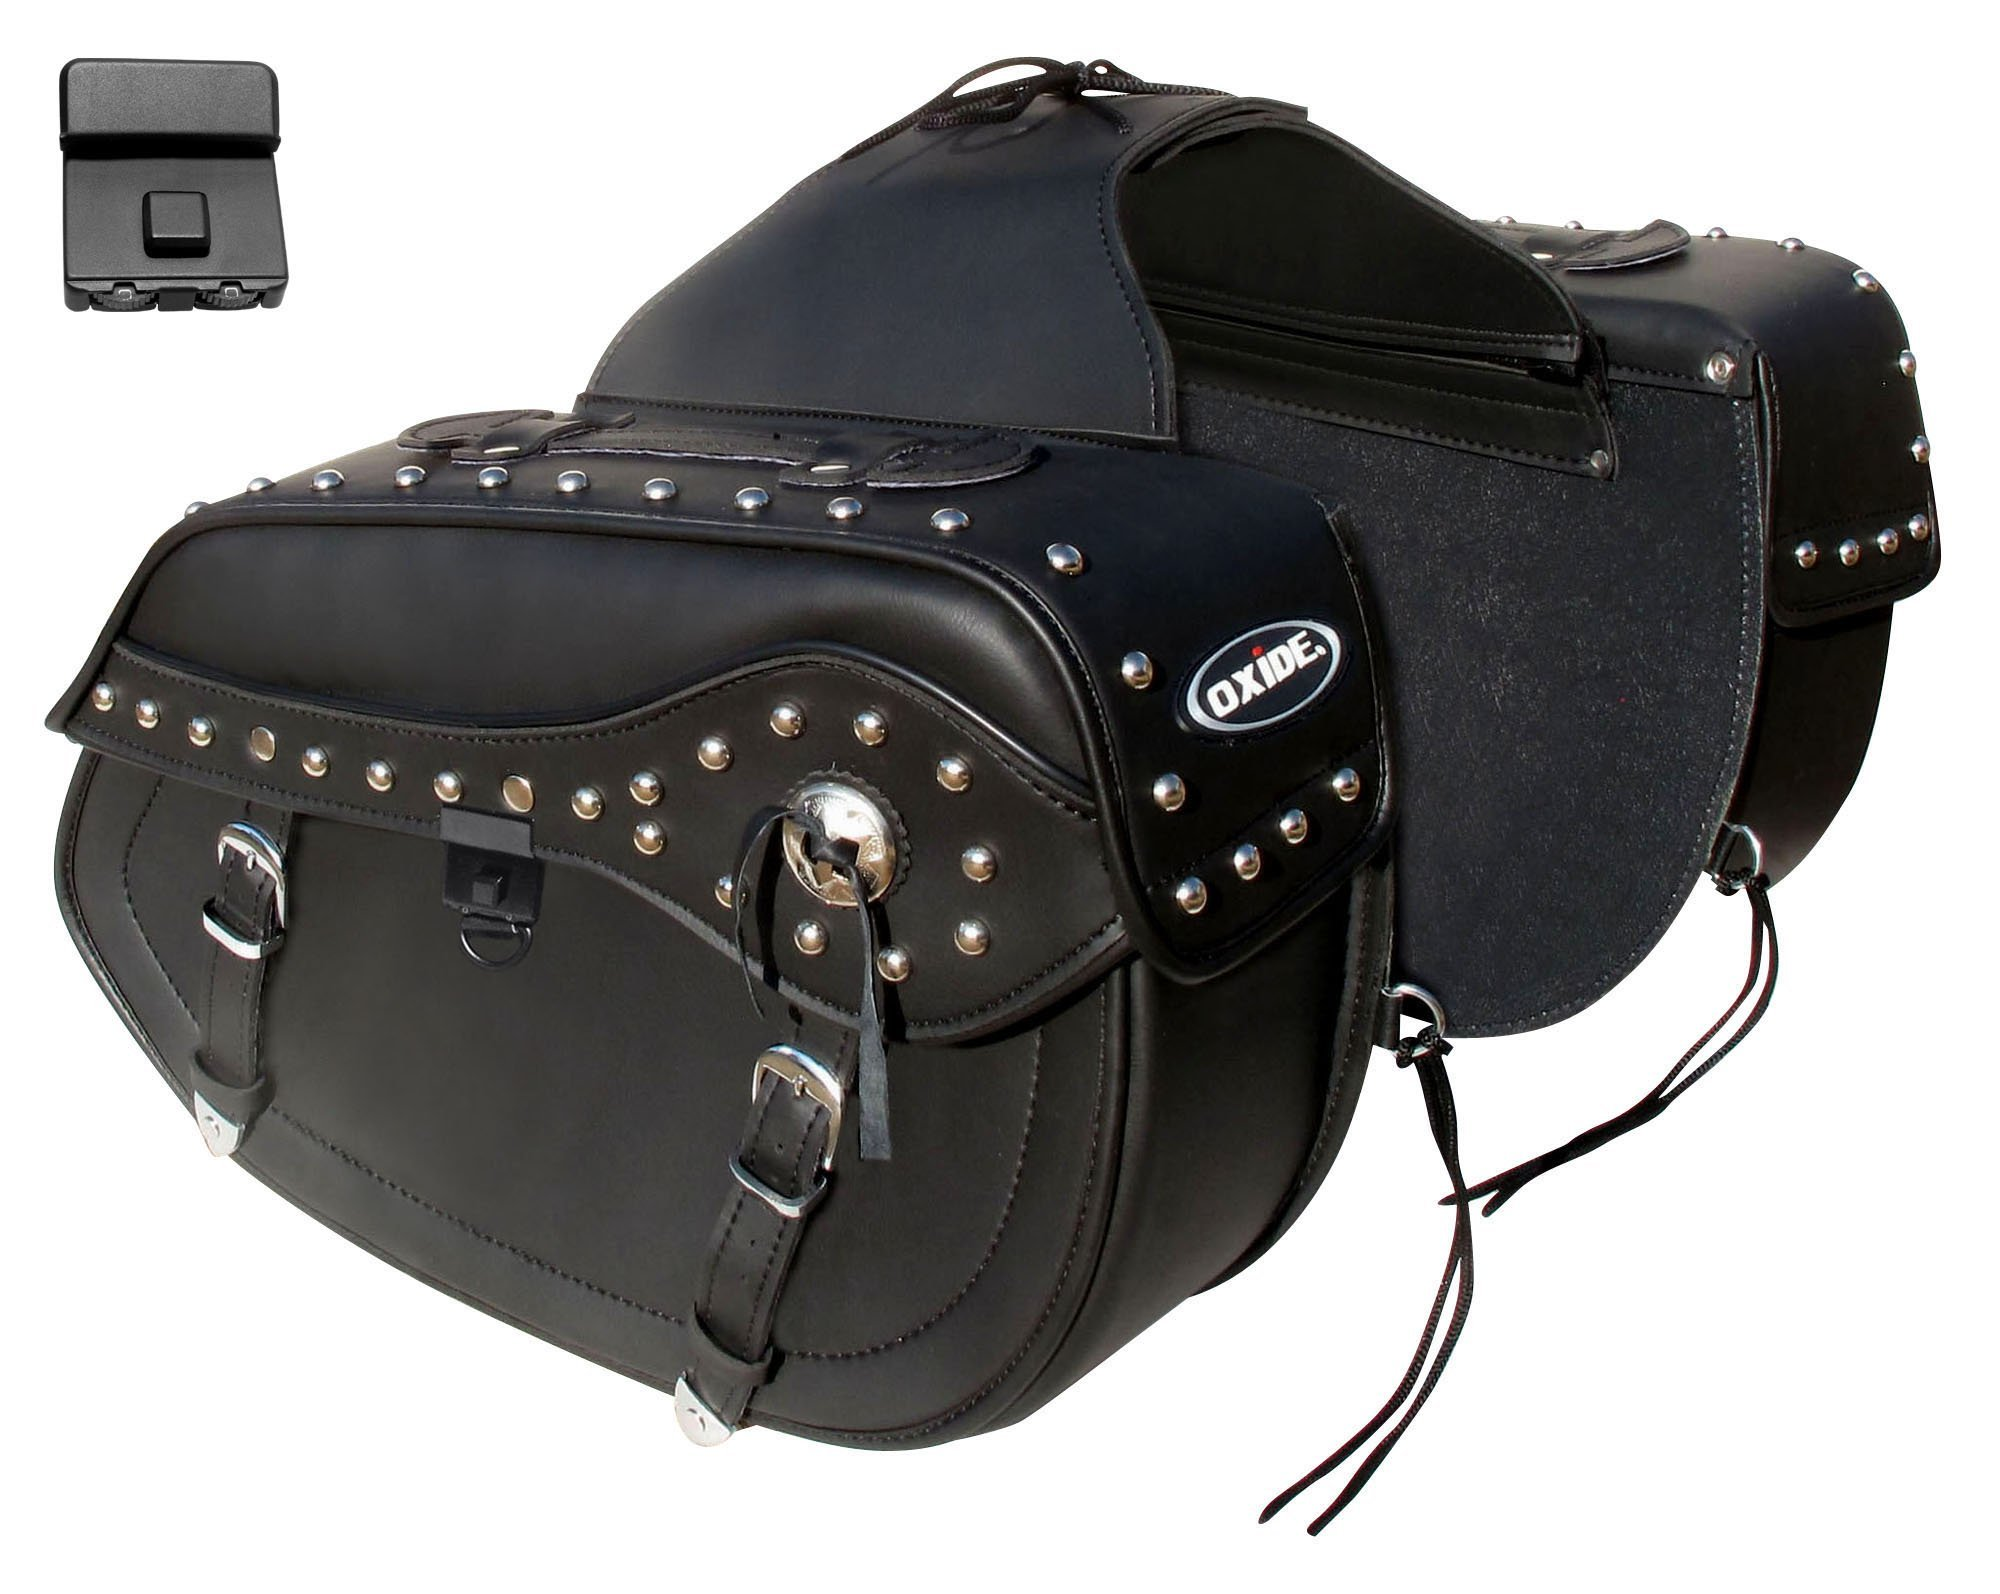 Oxide WS103 Large Tek leather Cruiser Motorcycle Panniers bike panniers motorcycle saddlebags travel bag